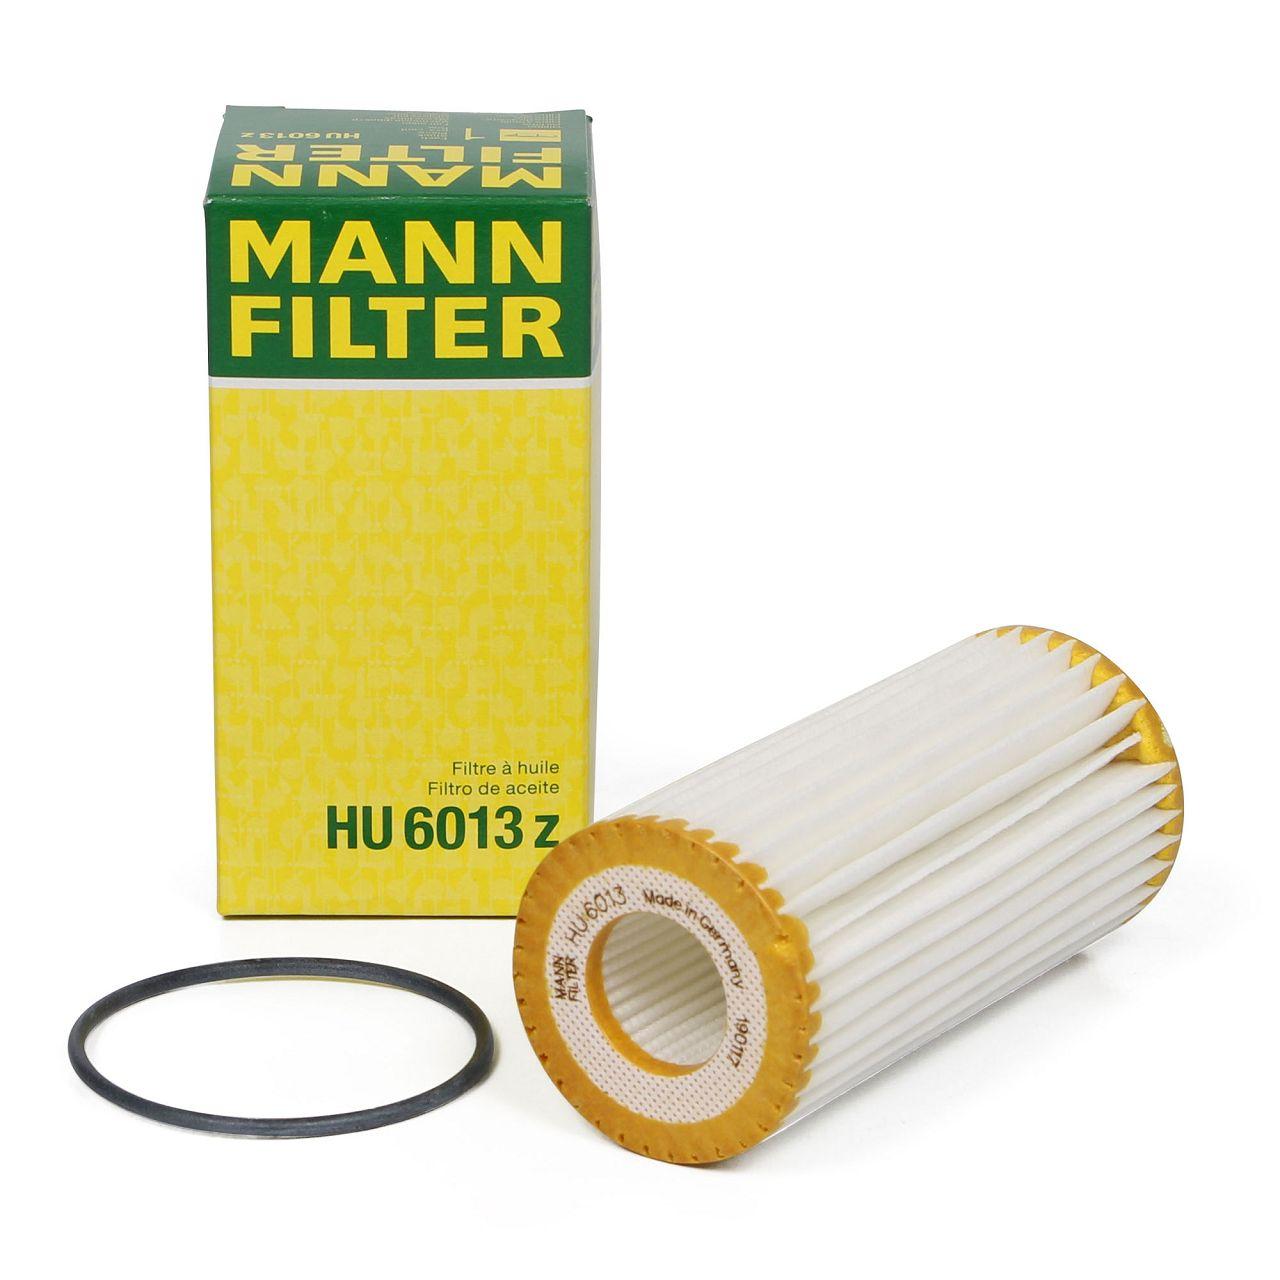 MANN Ölfilter HU6013z für AUDI PORSCHE SEAT SKODA VW 1.8 TFSI 2.0 TFSI / GTI / R